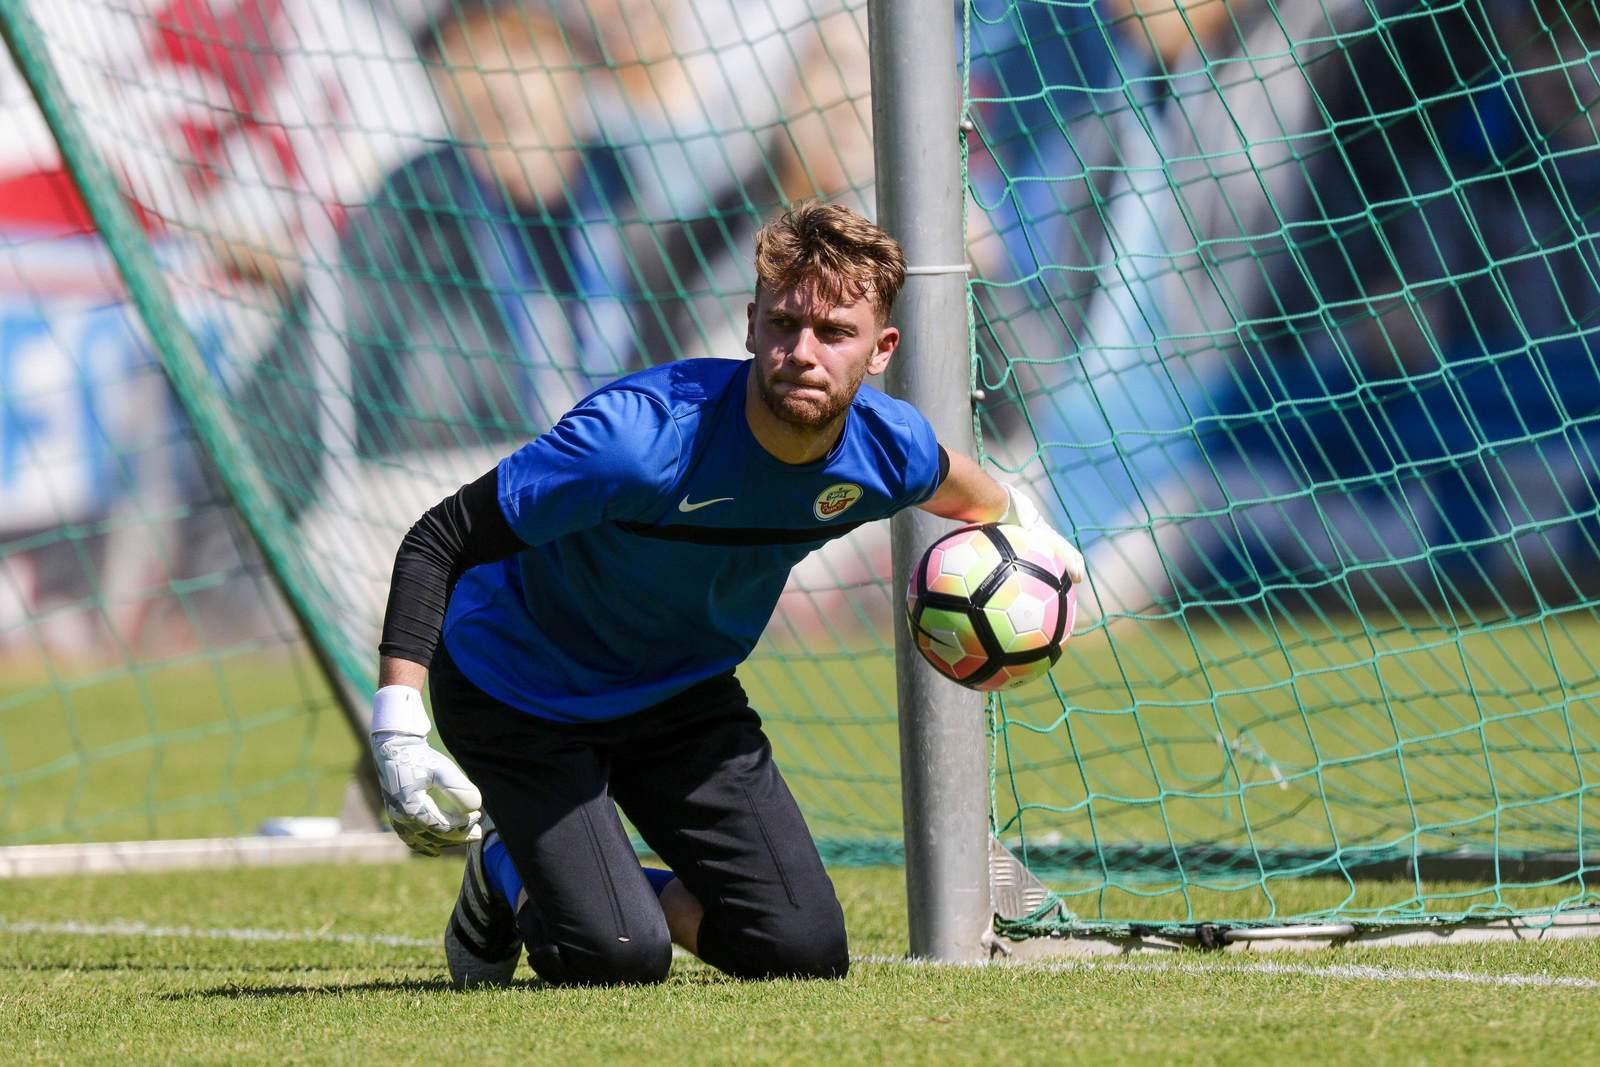 Luis Zwick vom FC Hansa Rostock